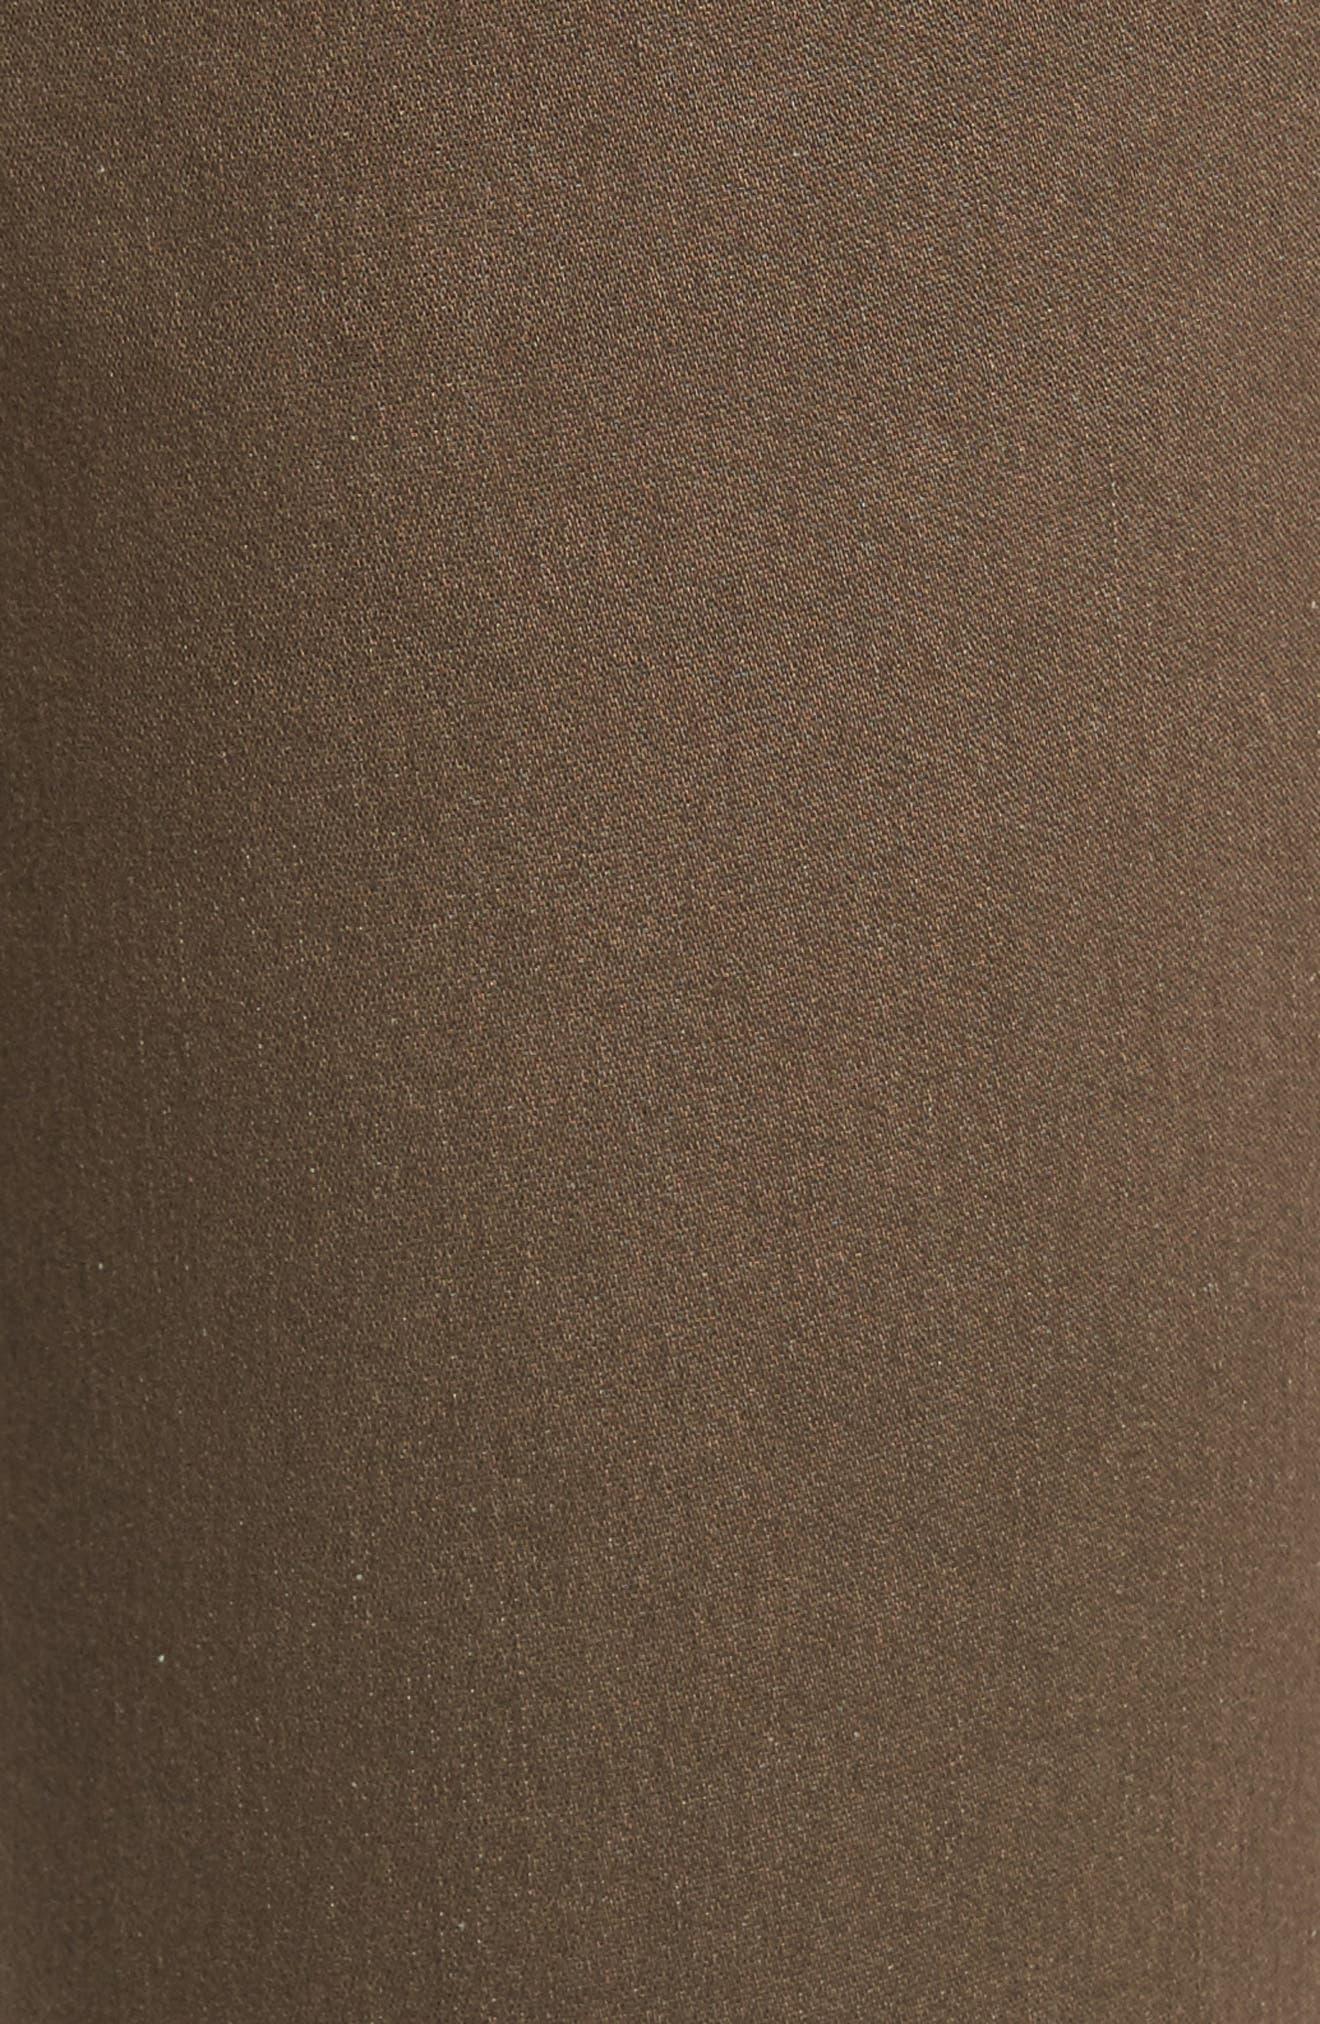 Ryan Knit Skinny Jeans,                             Alternate thumbnail 5, color,                             205